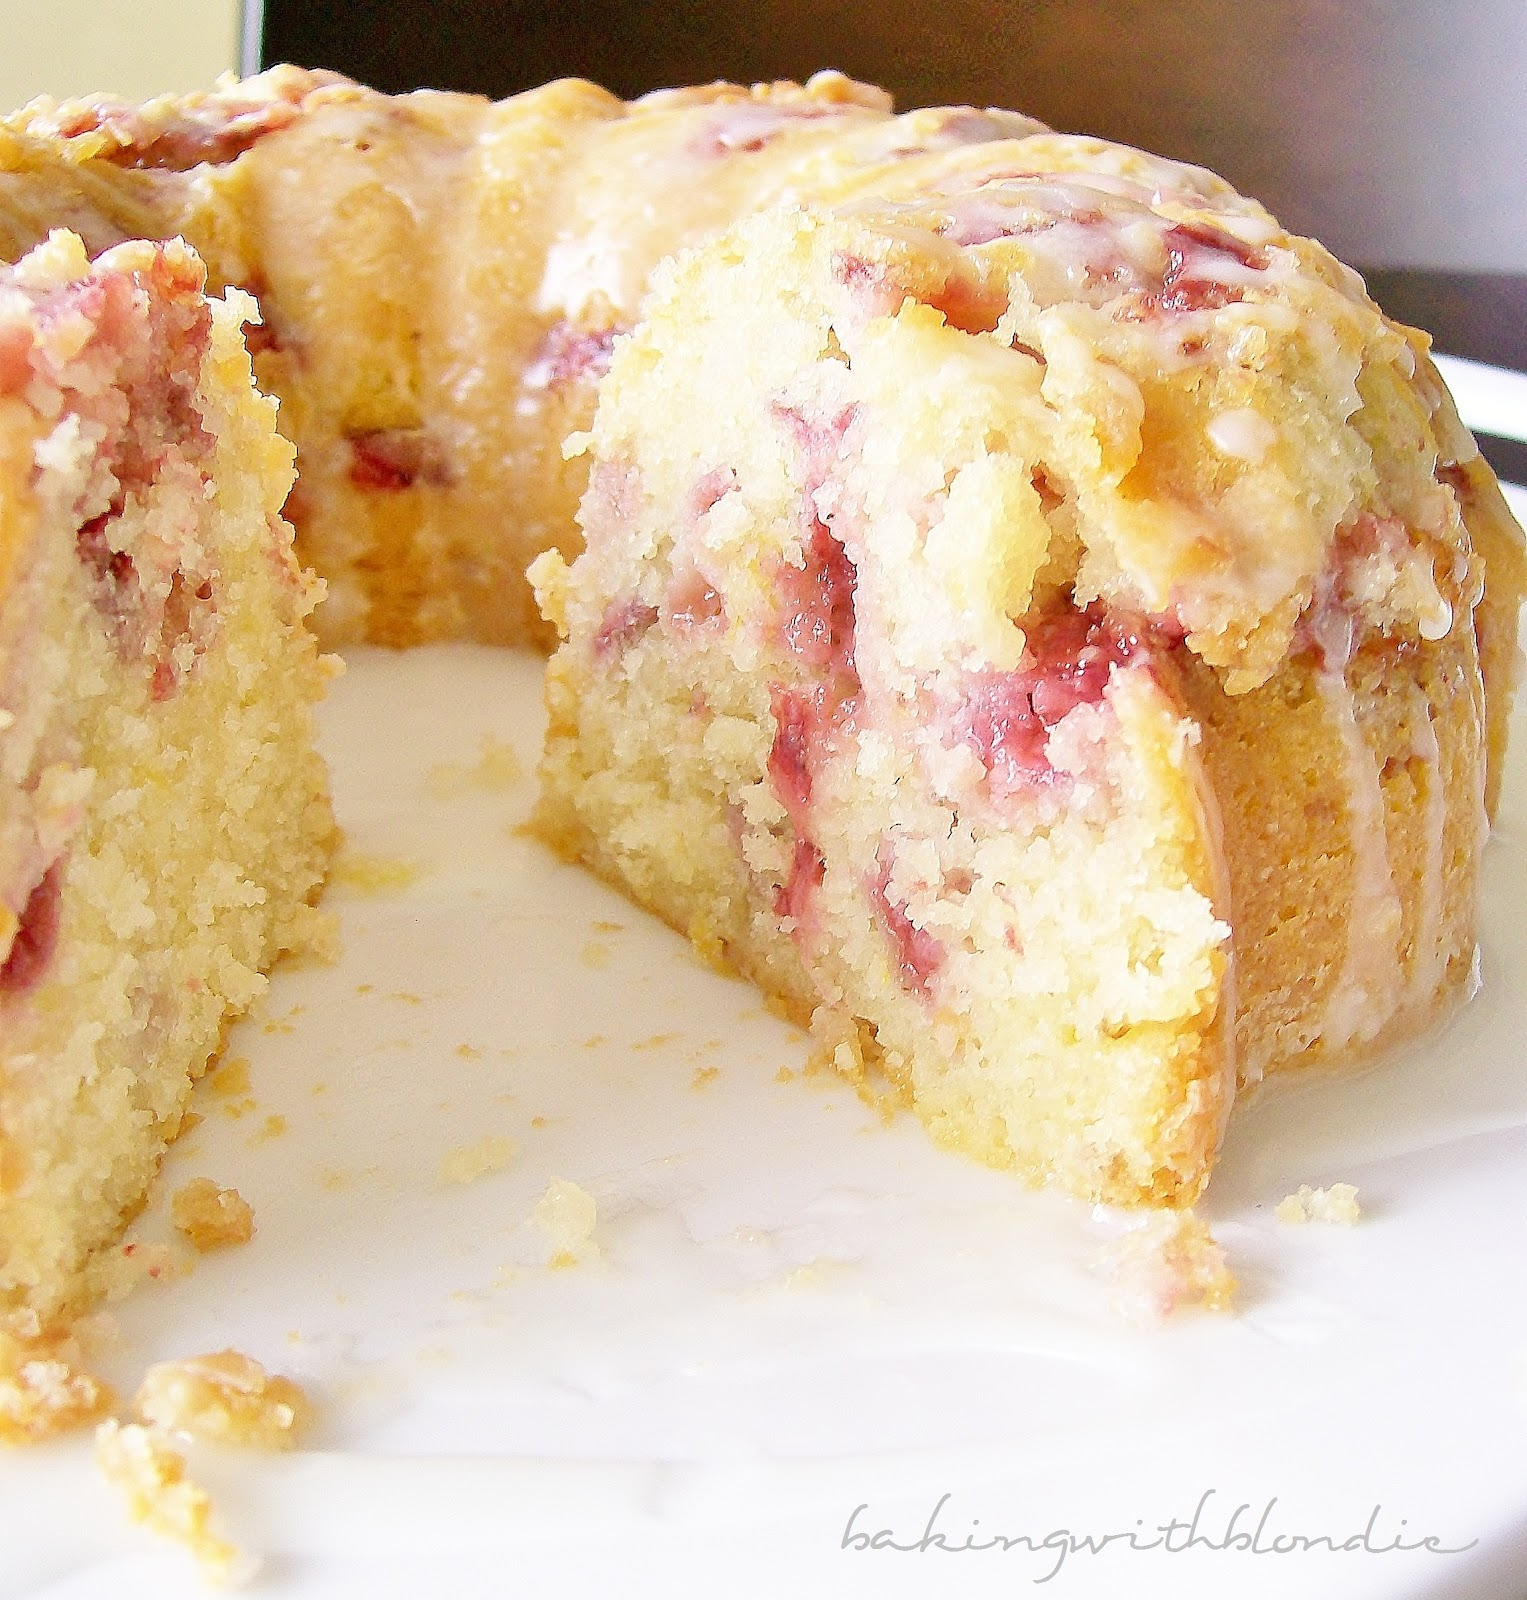 Strawberry Greek Yogurt Cake